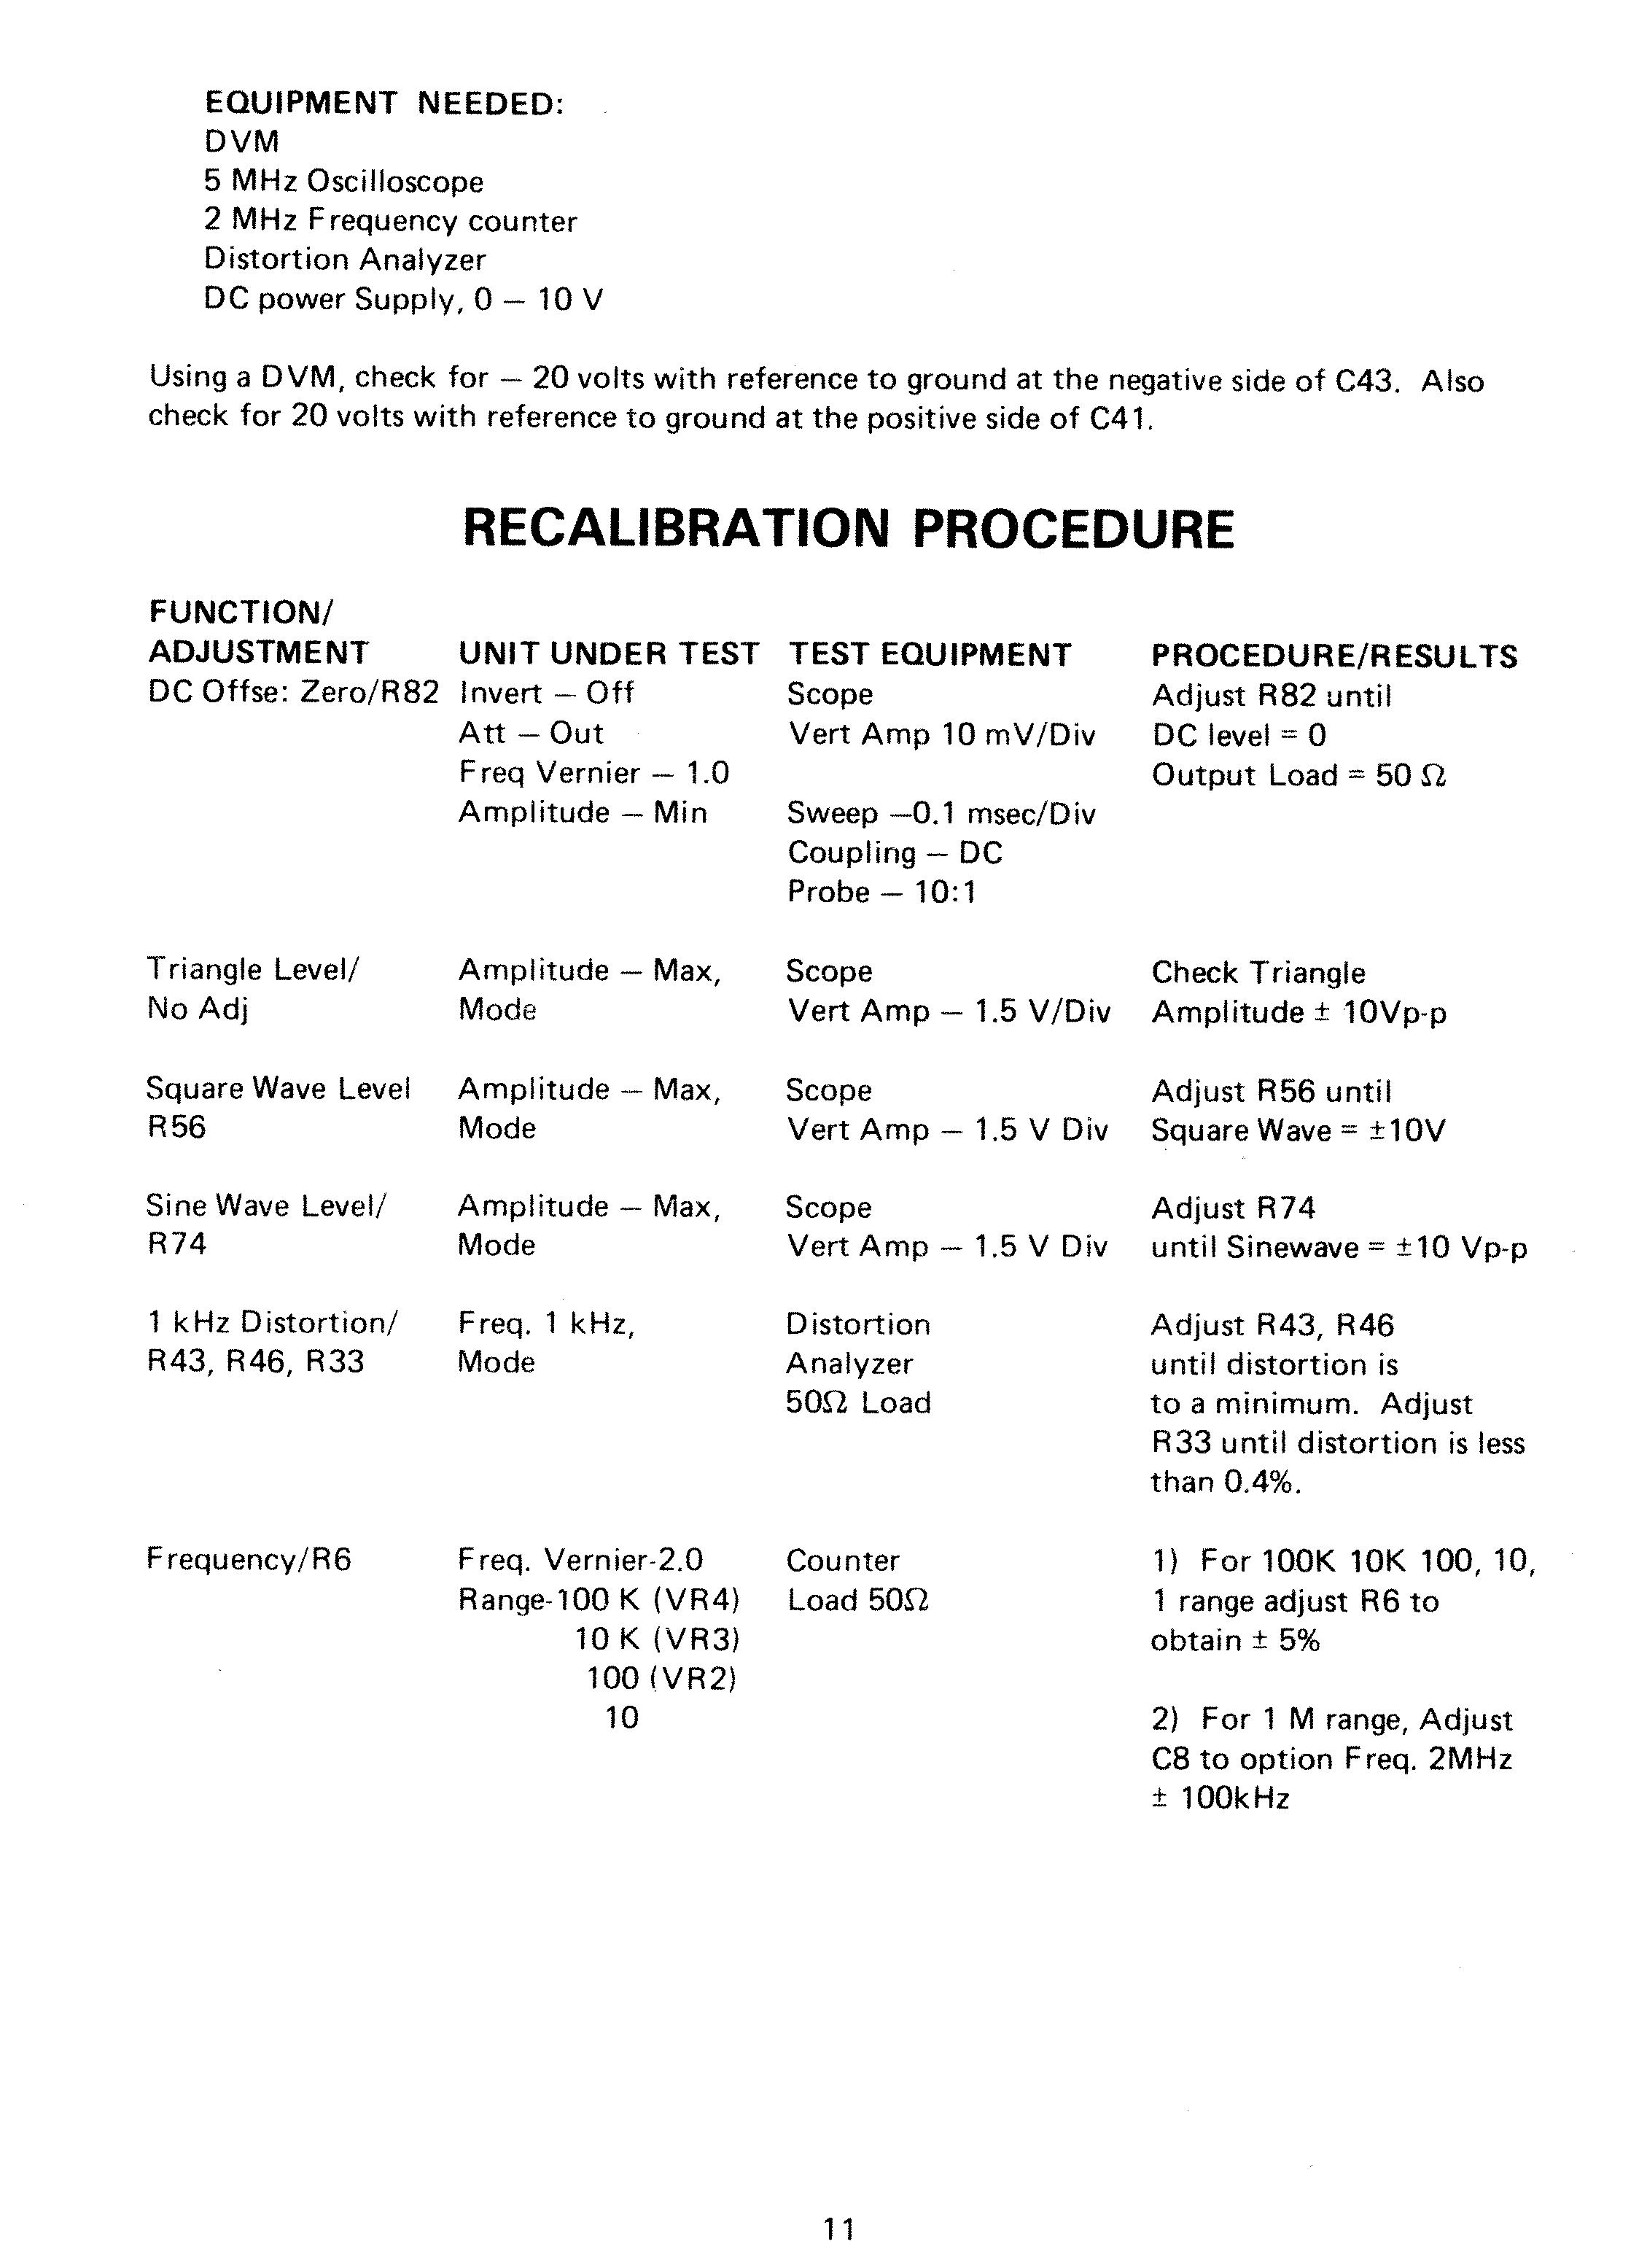 инструкция осциллографа сага